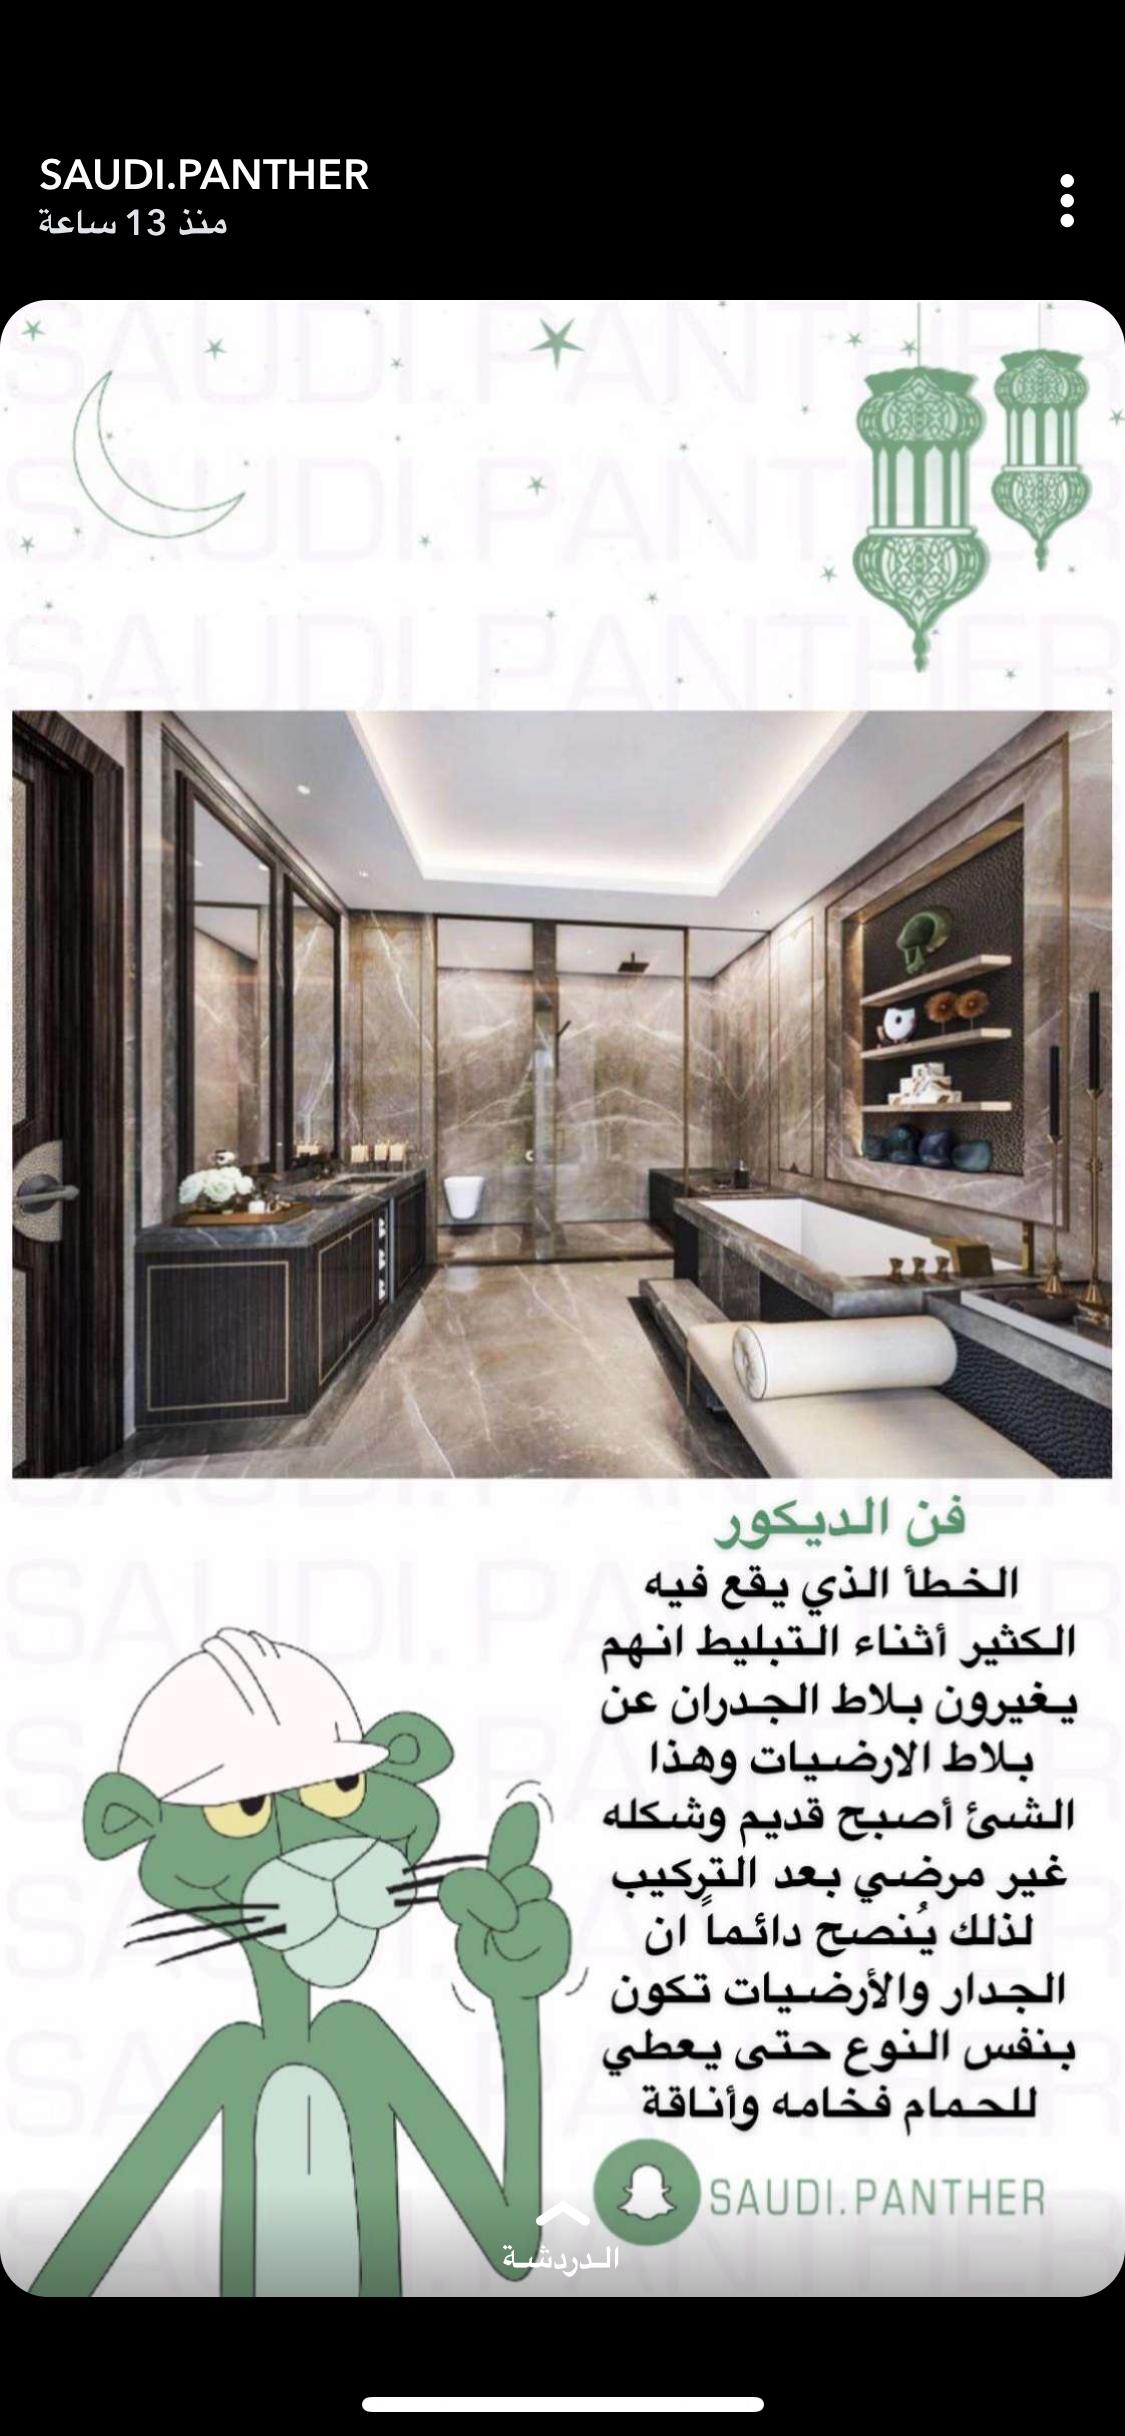 فن الديكور تبليط الجدران والأرضيات Home Design Decor Bathroom Design Luxury Home Goods Decor